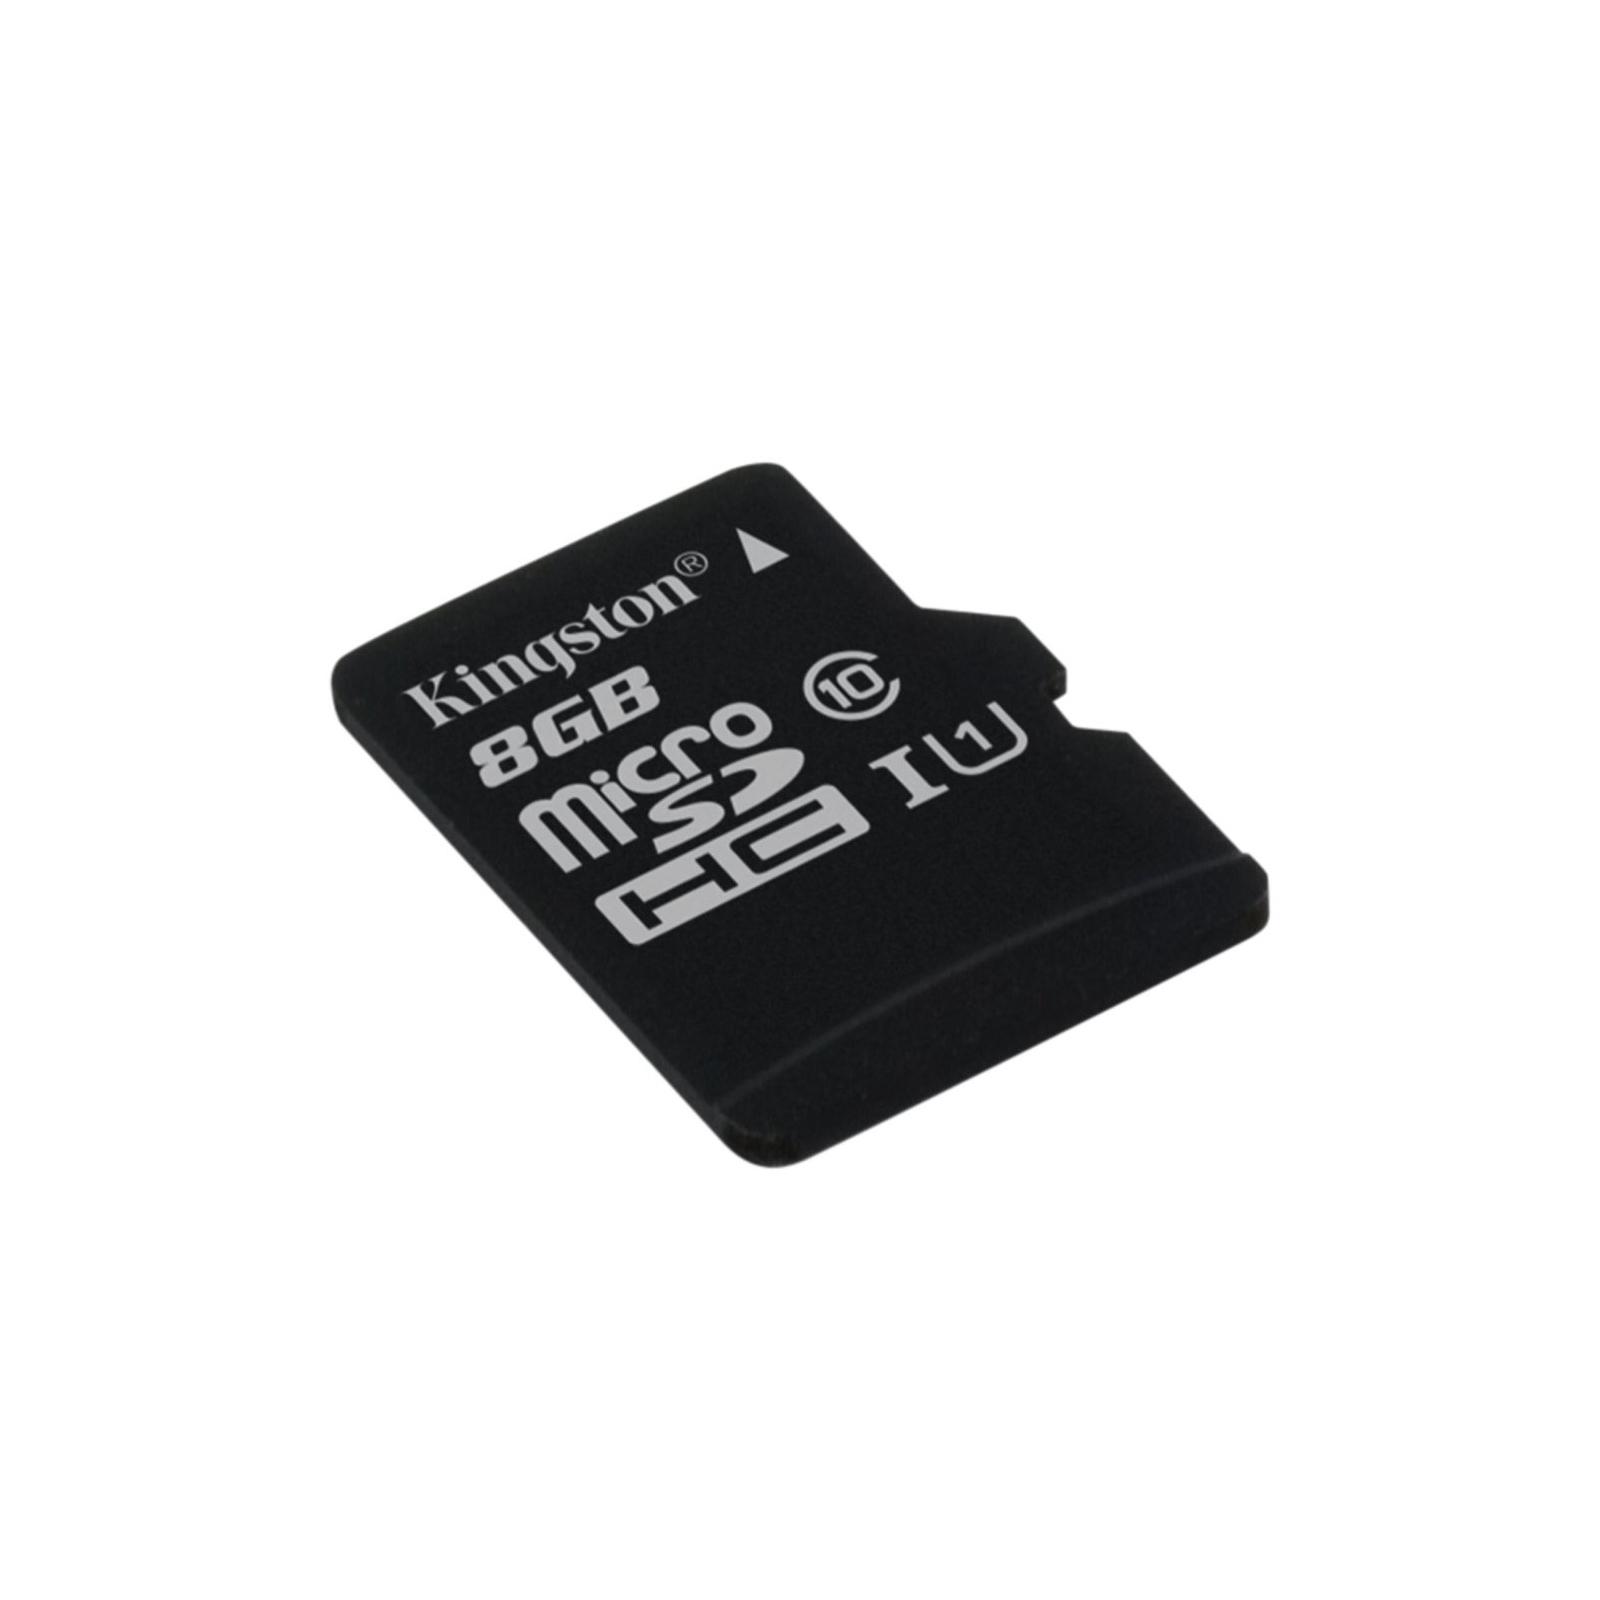 Карта памяти Kingston 8GB microSDXC Class 10 UHS-I (SDC10G2/8GBSP) изображение 2